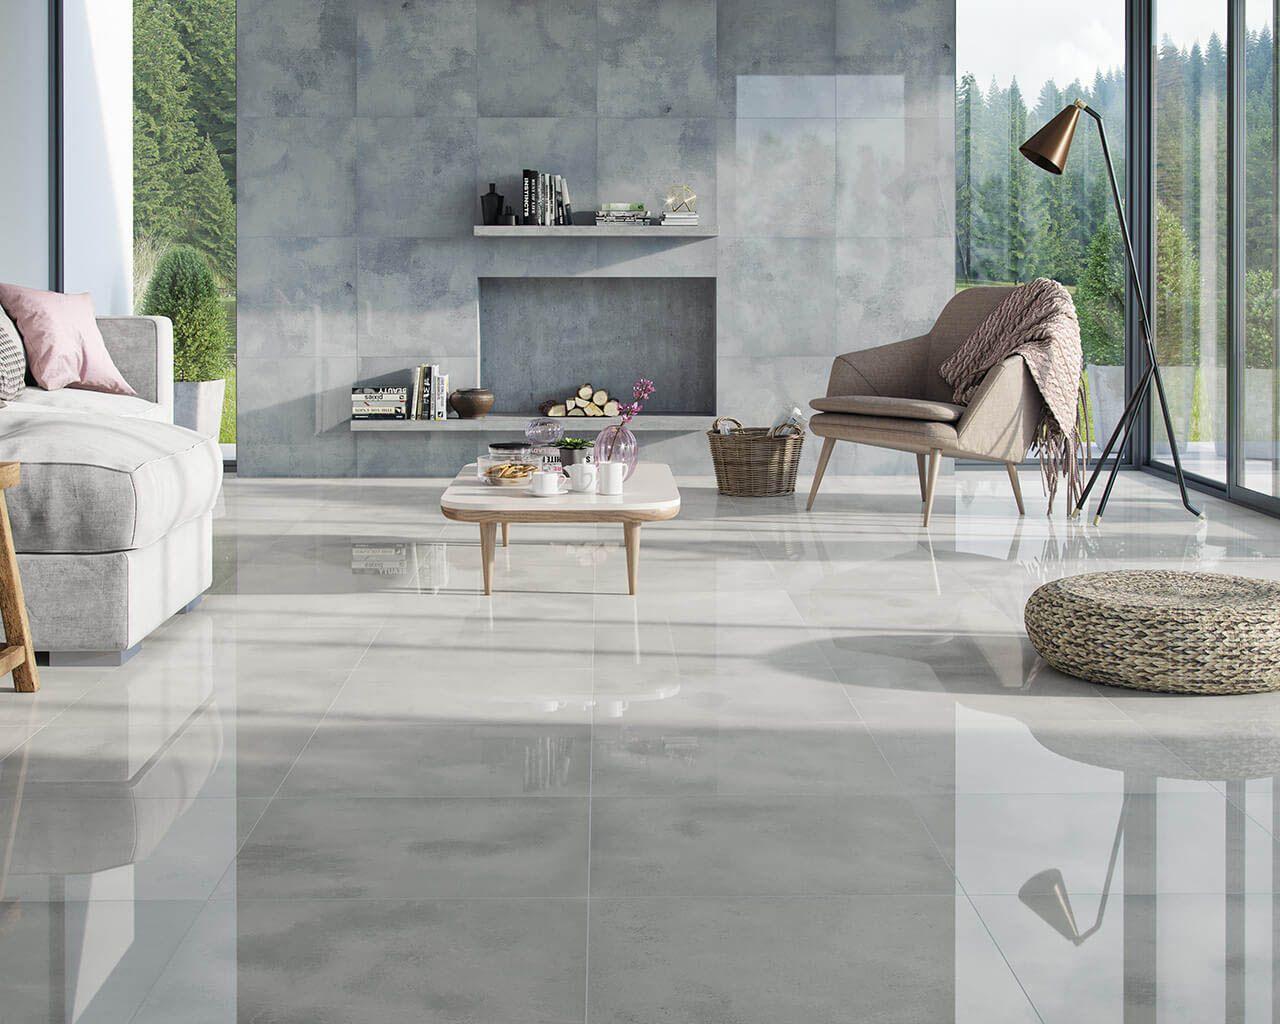 ceramic tiles looking like unique rocks